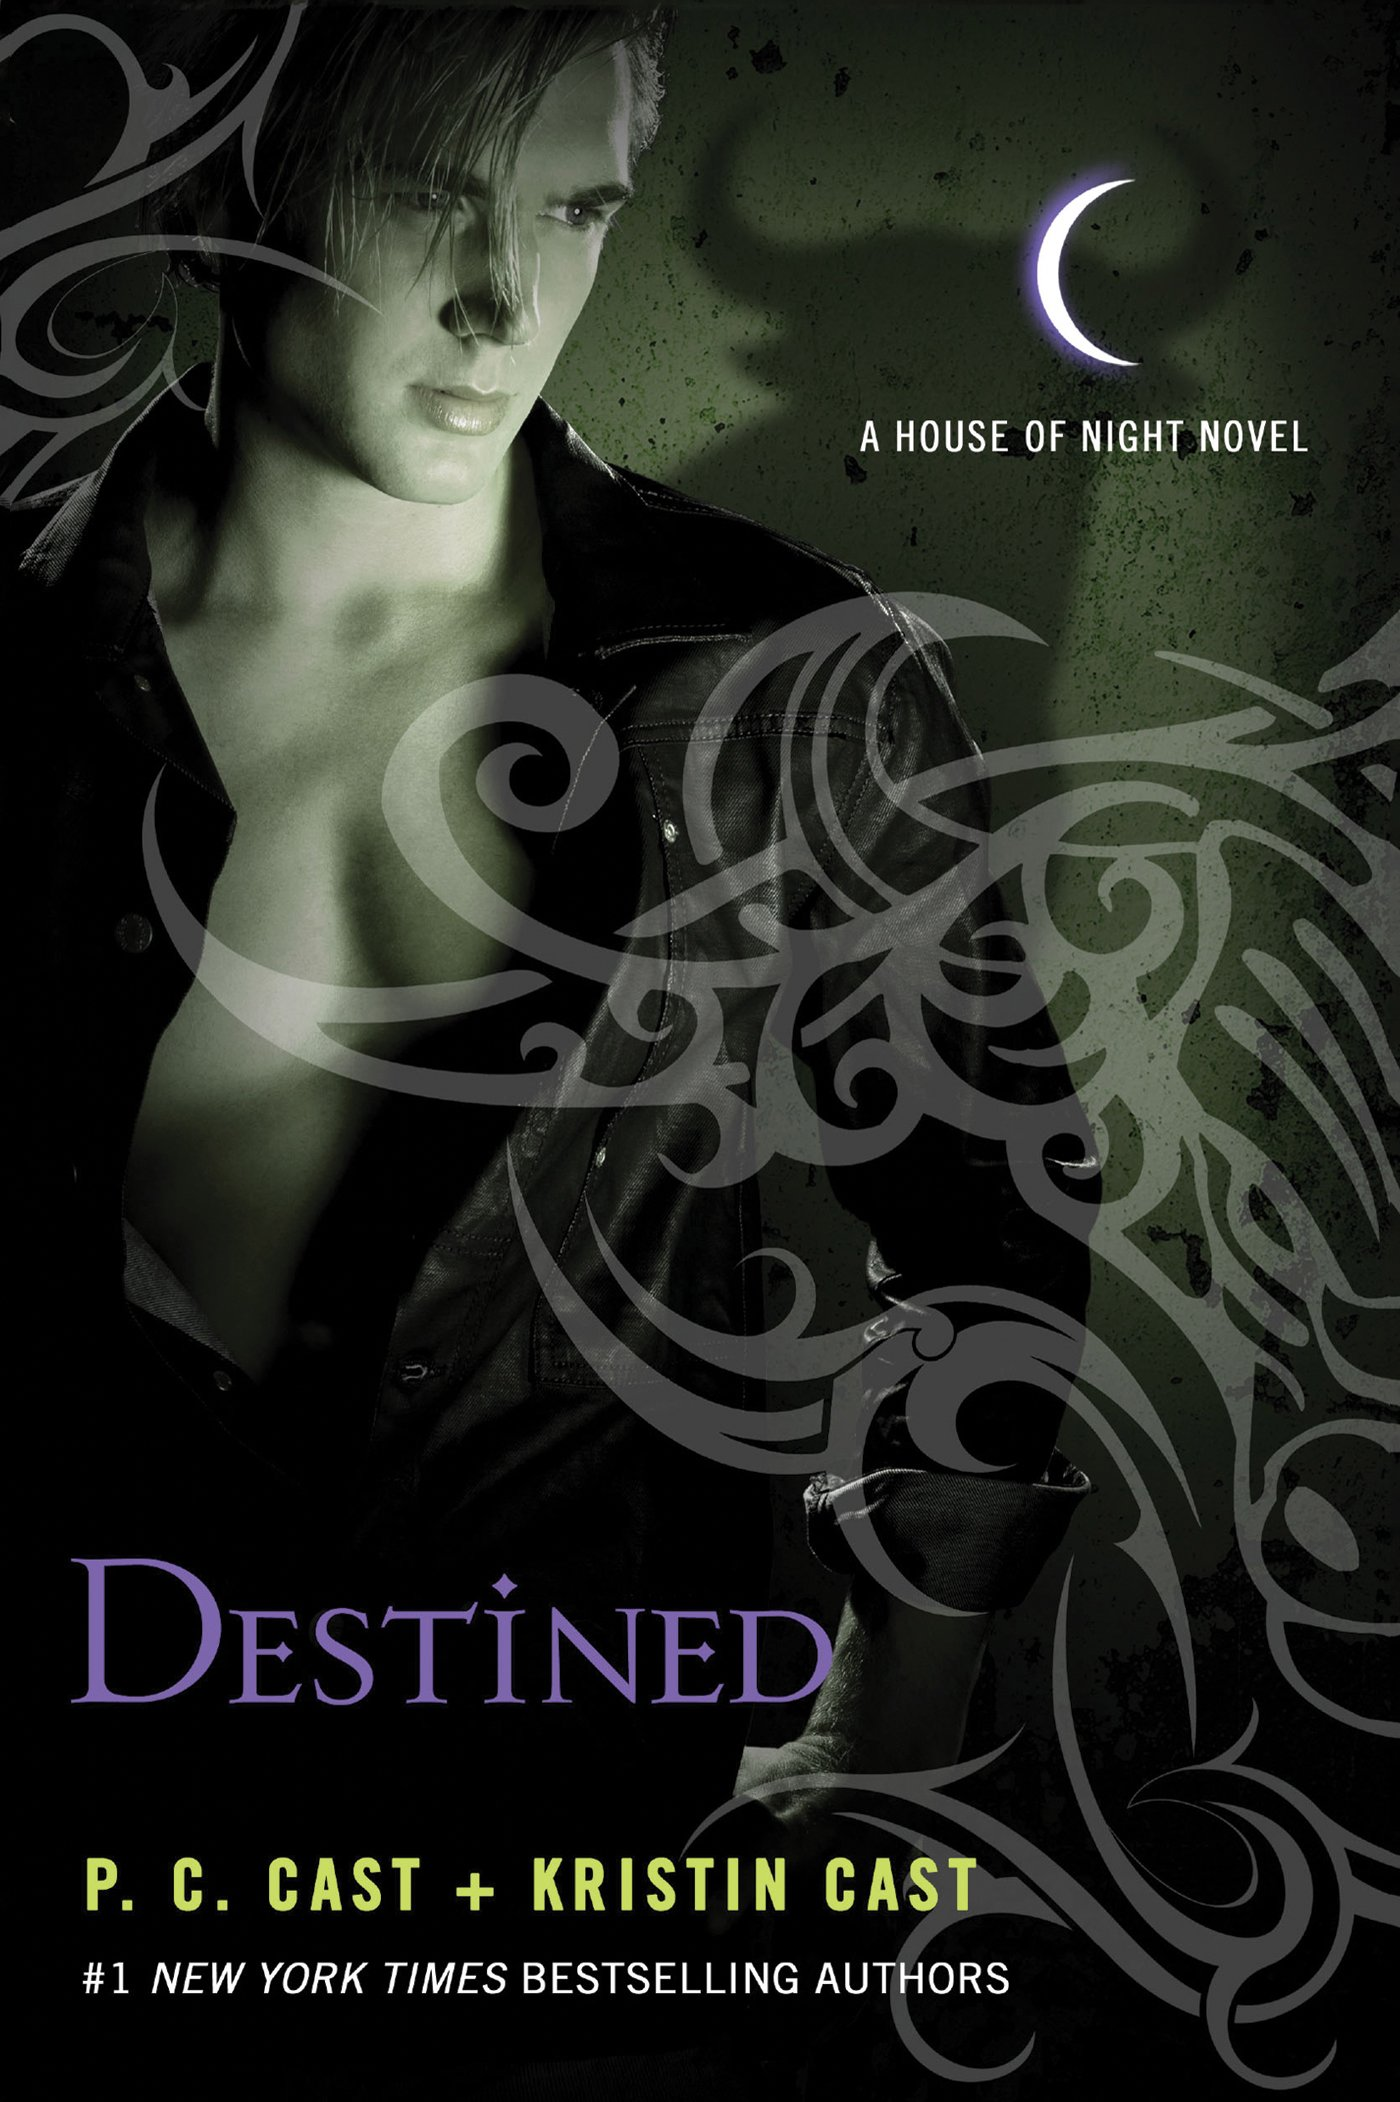 Amazon.com: Destined (House of Night Novels) (9780312387983 ...